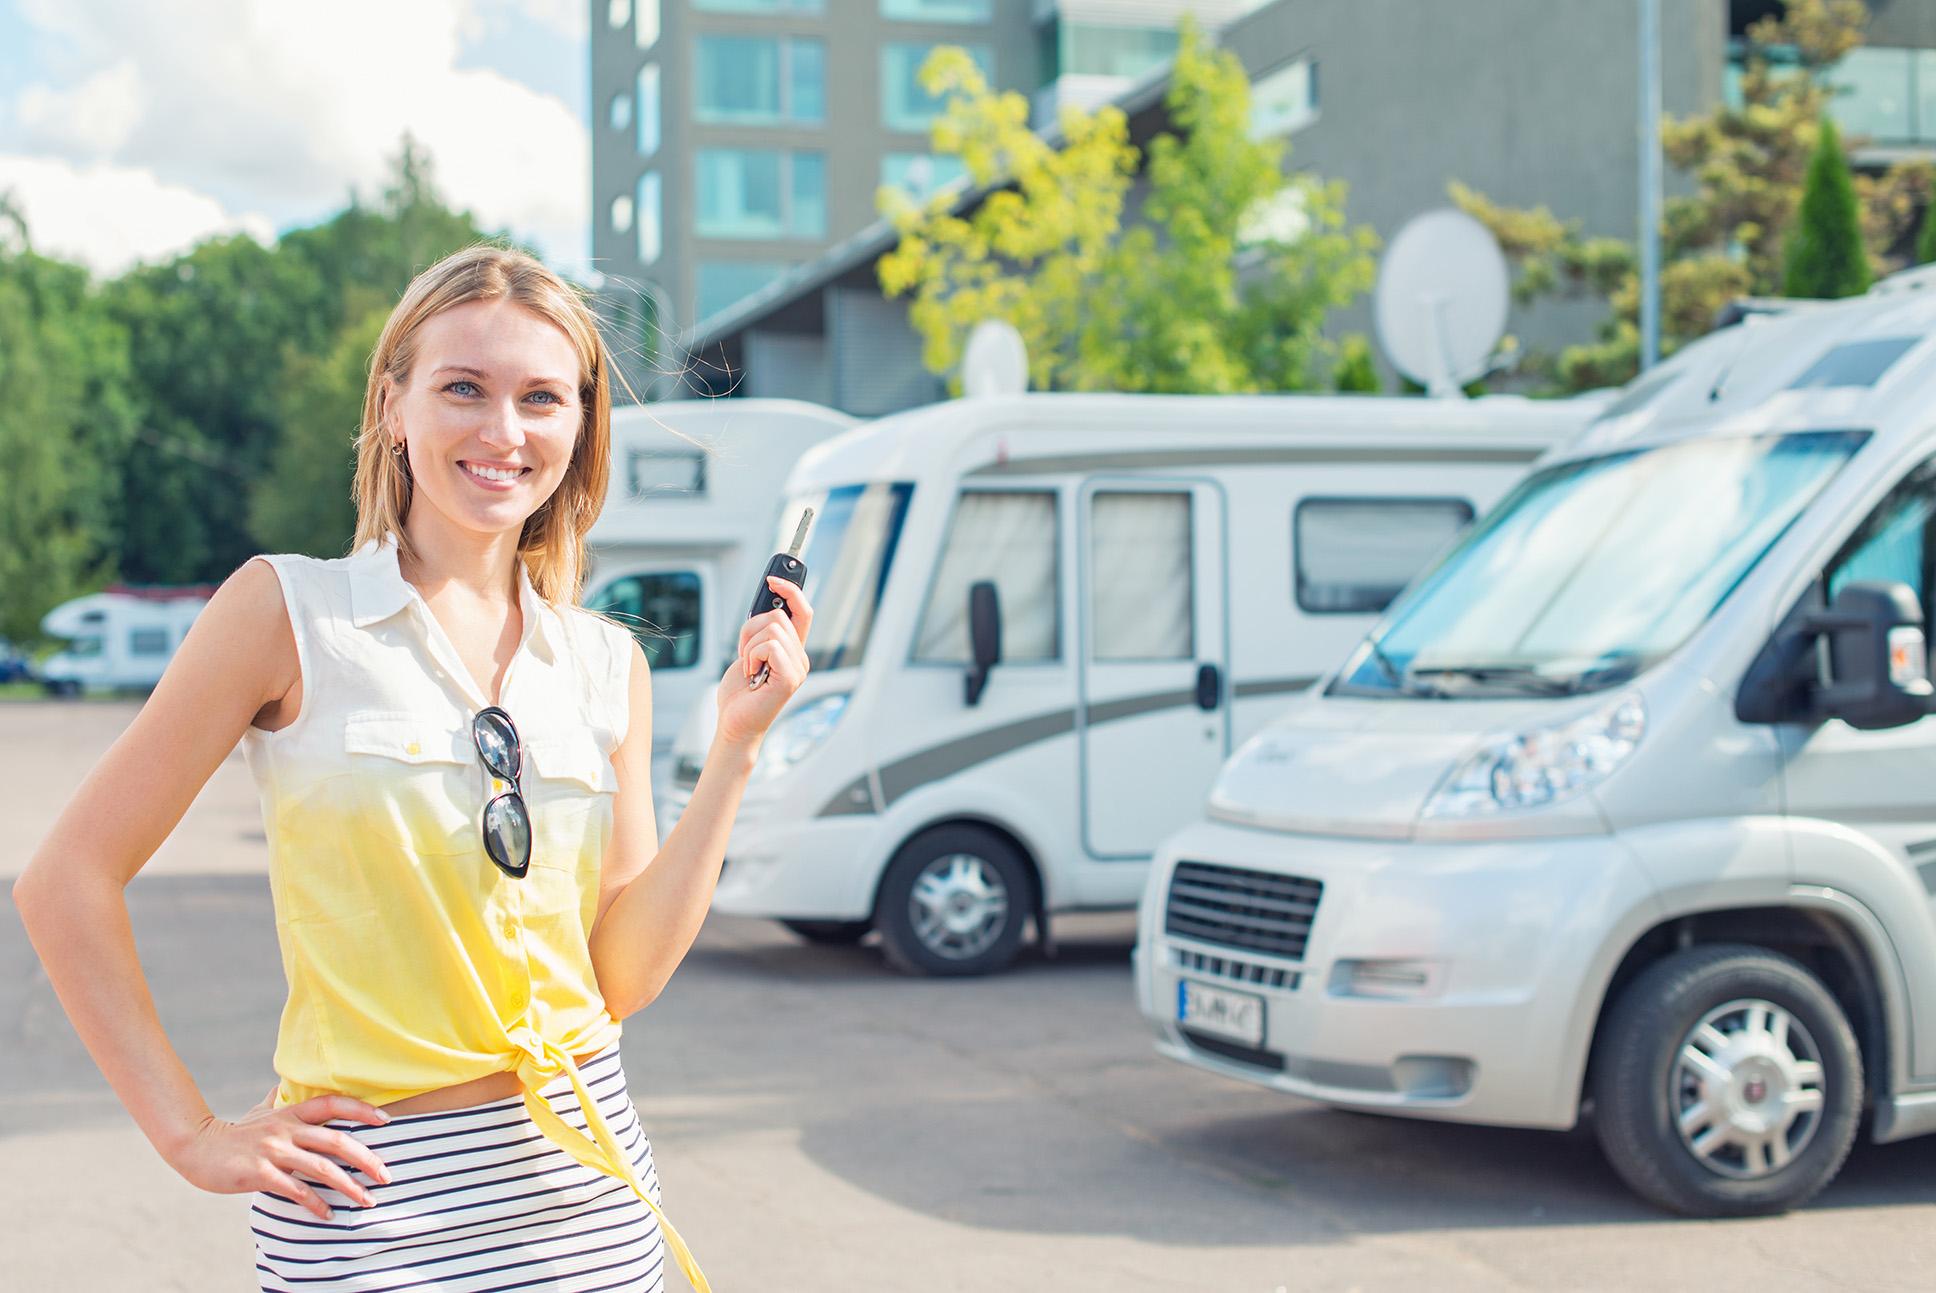 Beautiful young woman offers vans at Los Angeles van rental